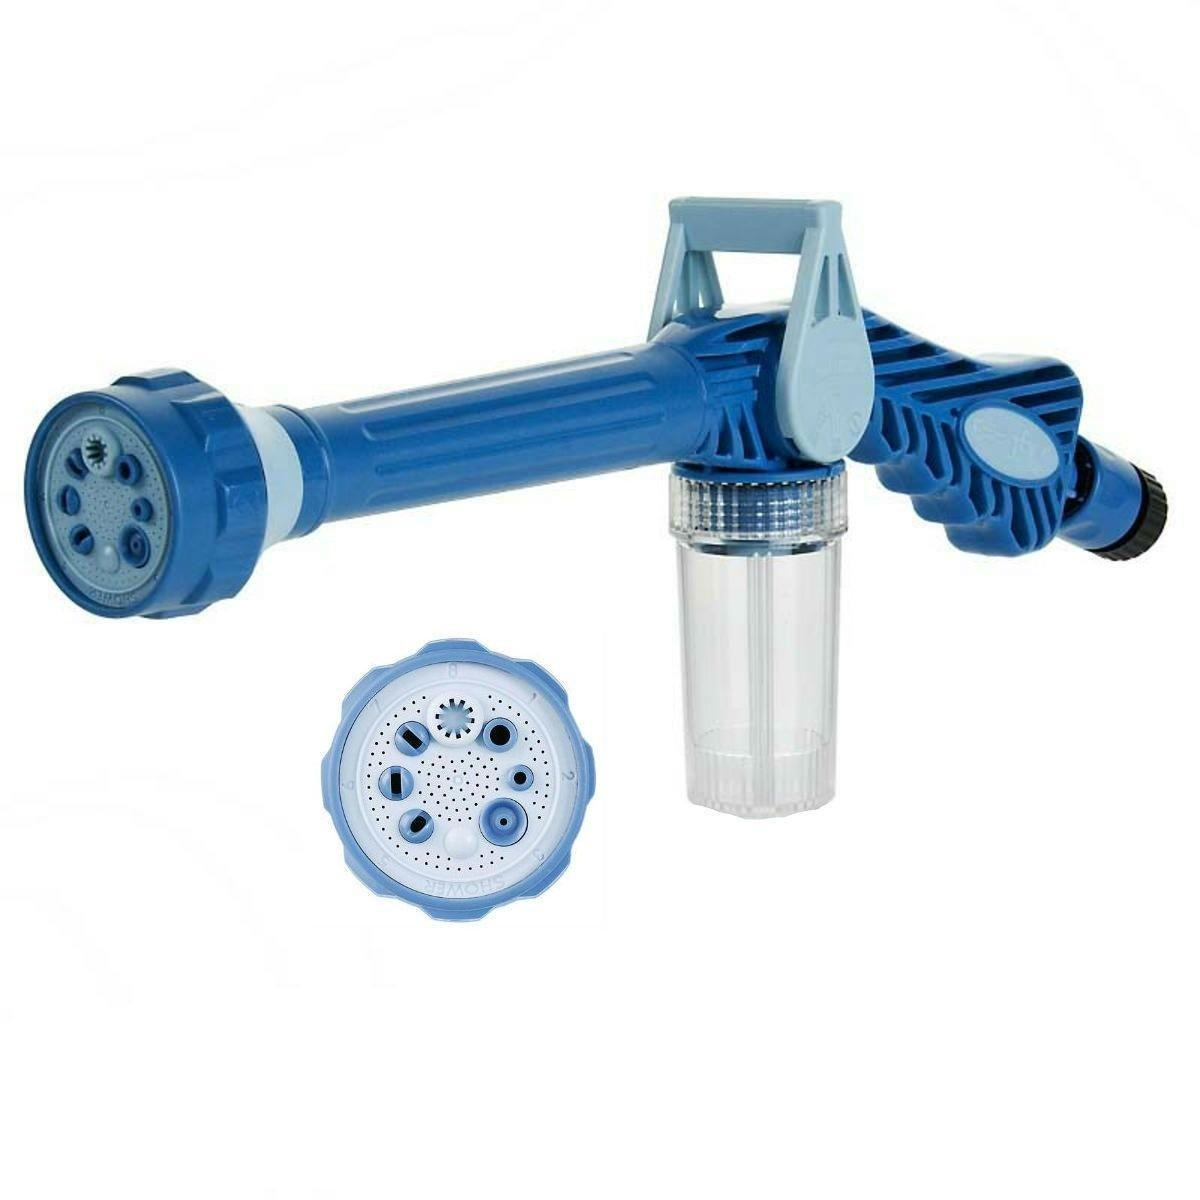 Водомет, розпилювач води, водяна гармата, насадка на шланг Ez Jet water cannon SKL11-130470